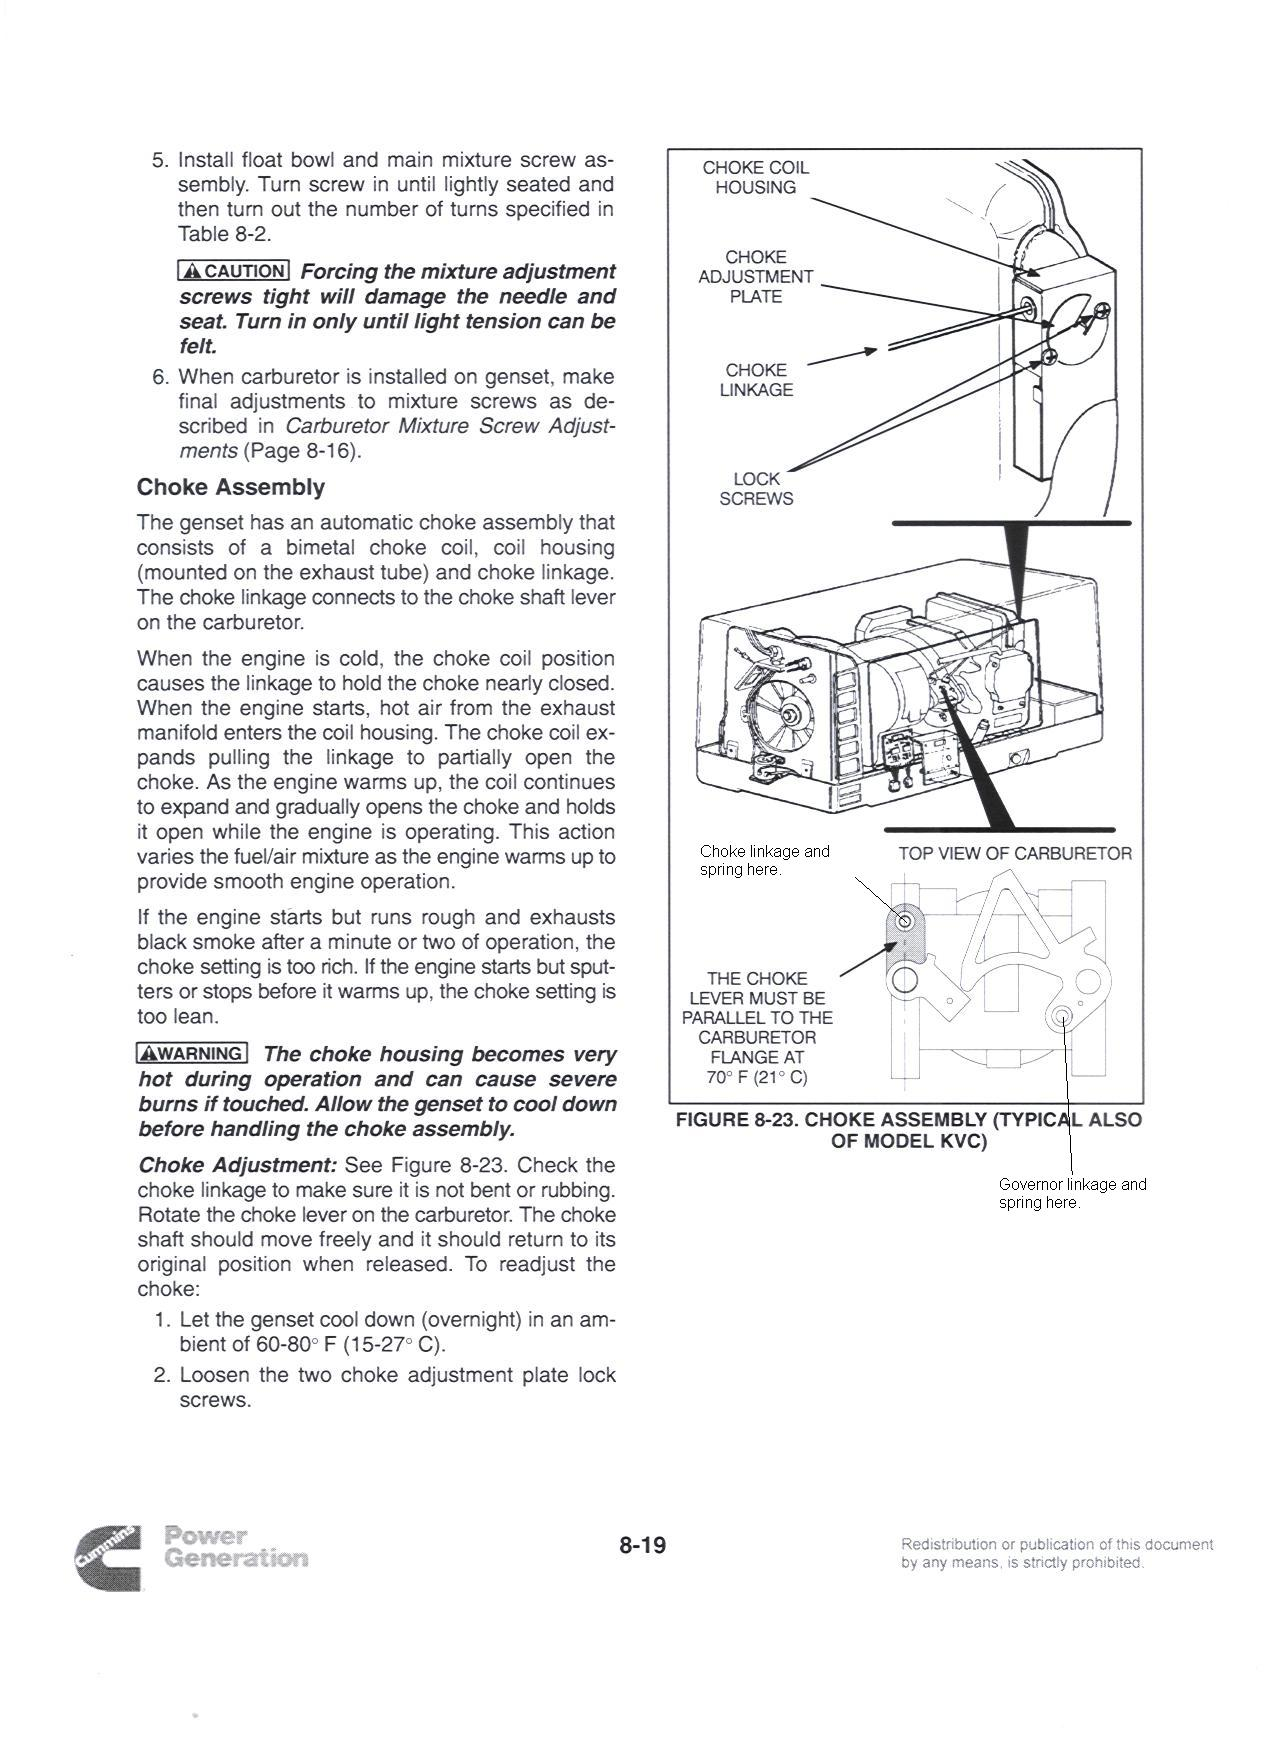 2011 09 13_163214_kv_carb onan microlite 4000 generator parts onan free image about wiring onan 2800 microlite generator wiring diagram at pacquiaovsvargaslive.co